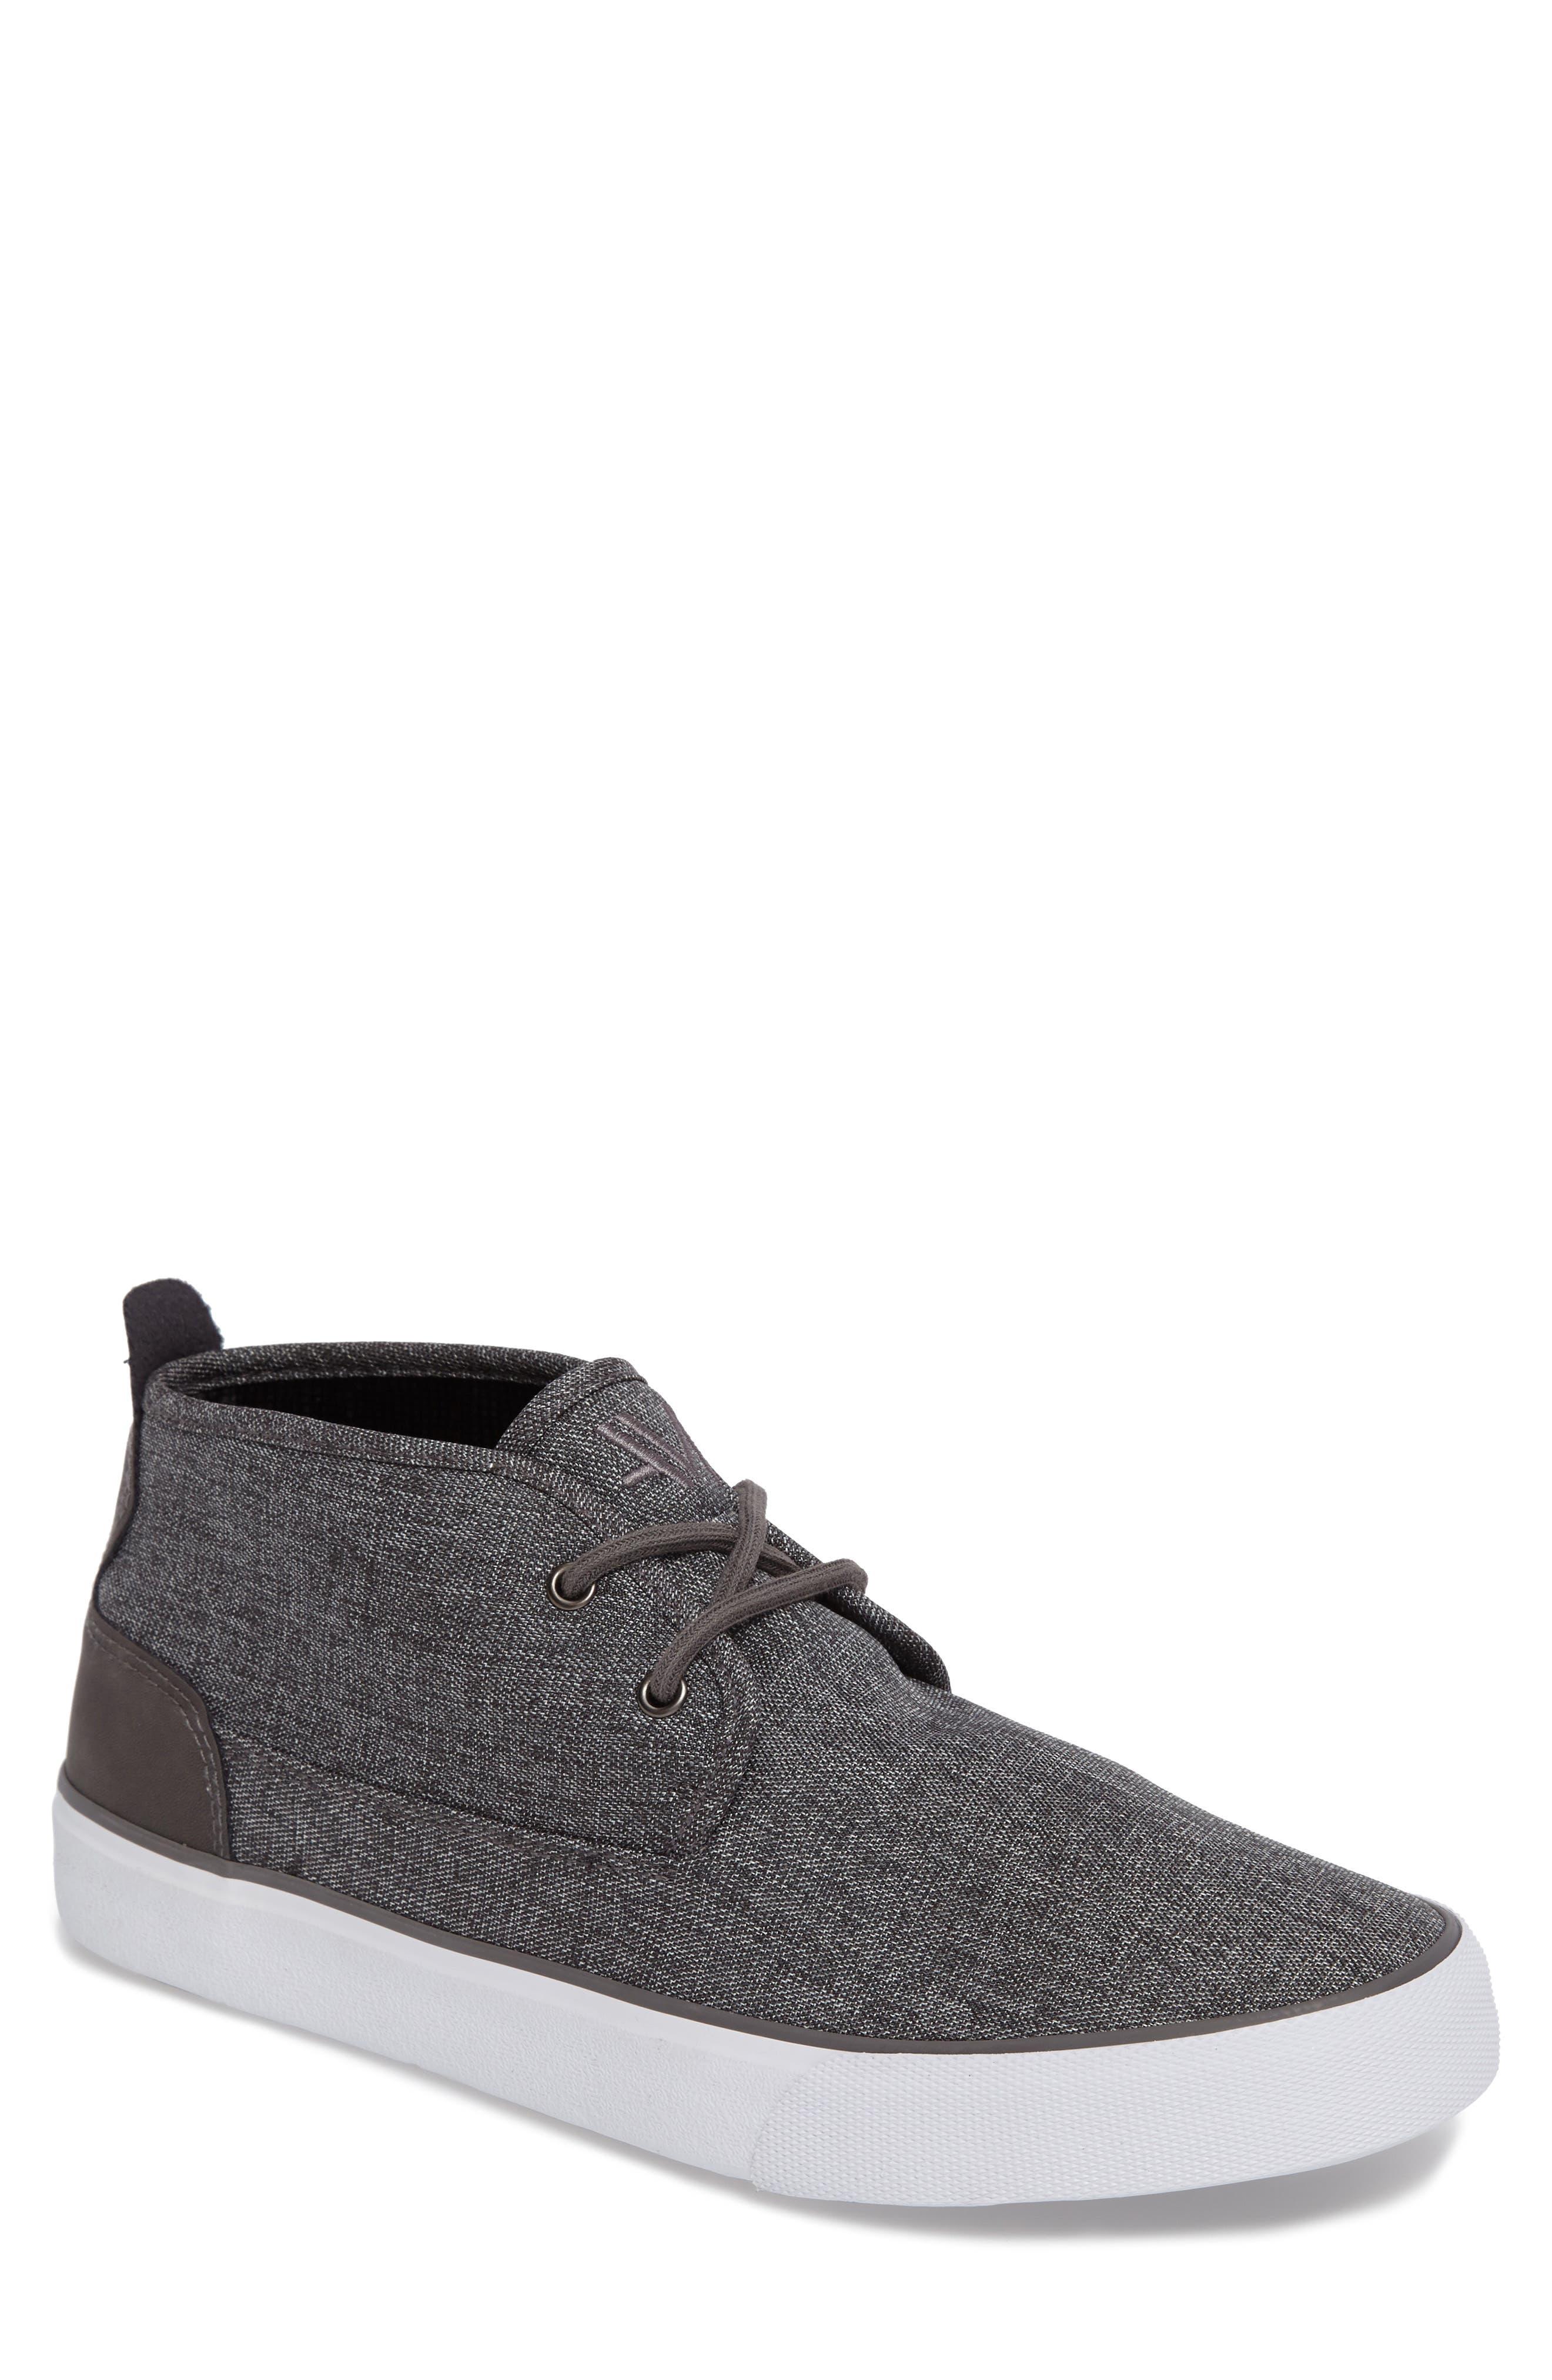 Reade Chukka Sneaker,                             Main thumbnail 1, color,                             Charcoal/Dk Charcoal/White